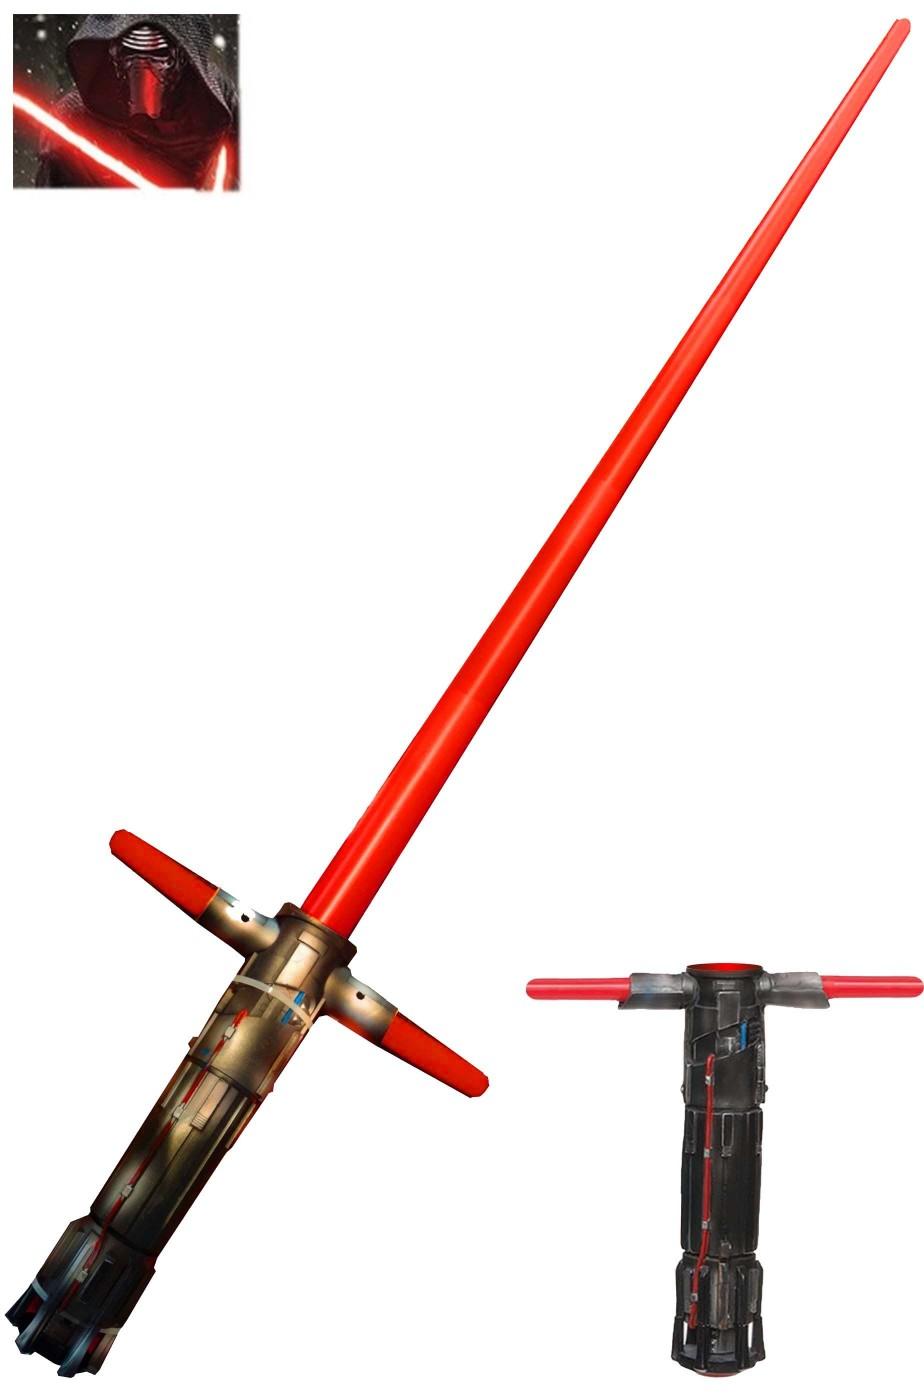 Spada Laser Adulto Kylo Ren a croce a X originale Star Wars gli ultimi Jedi